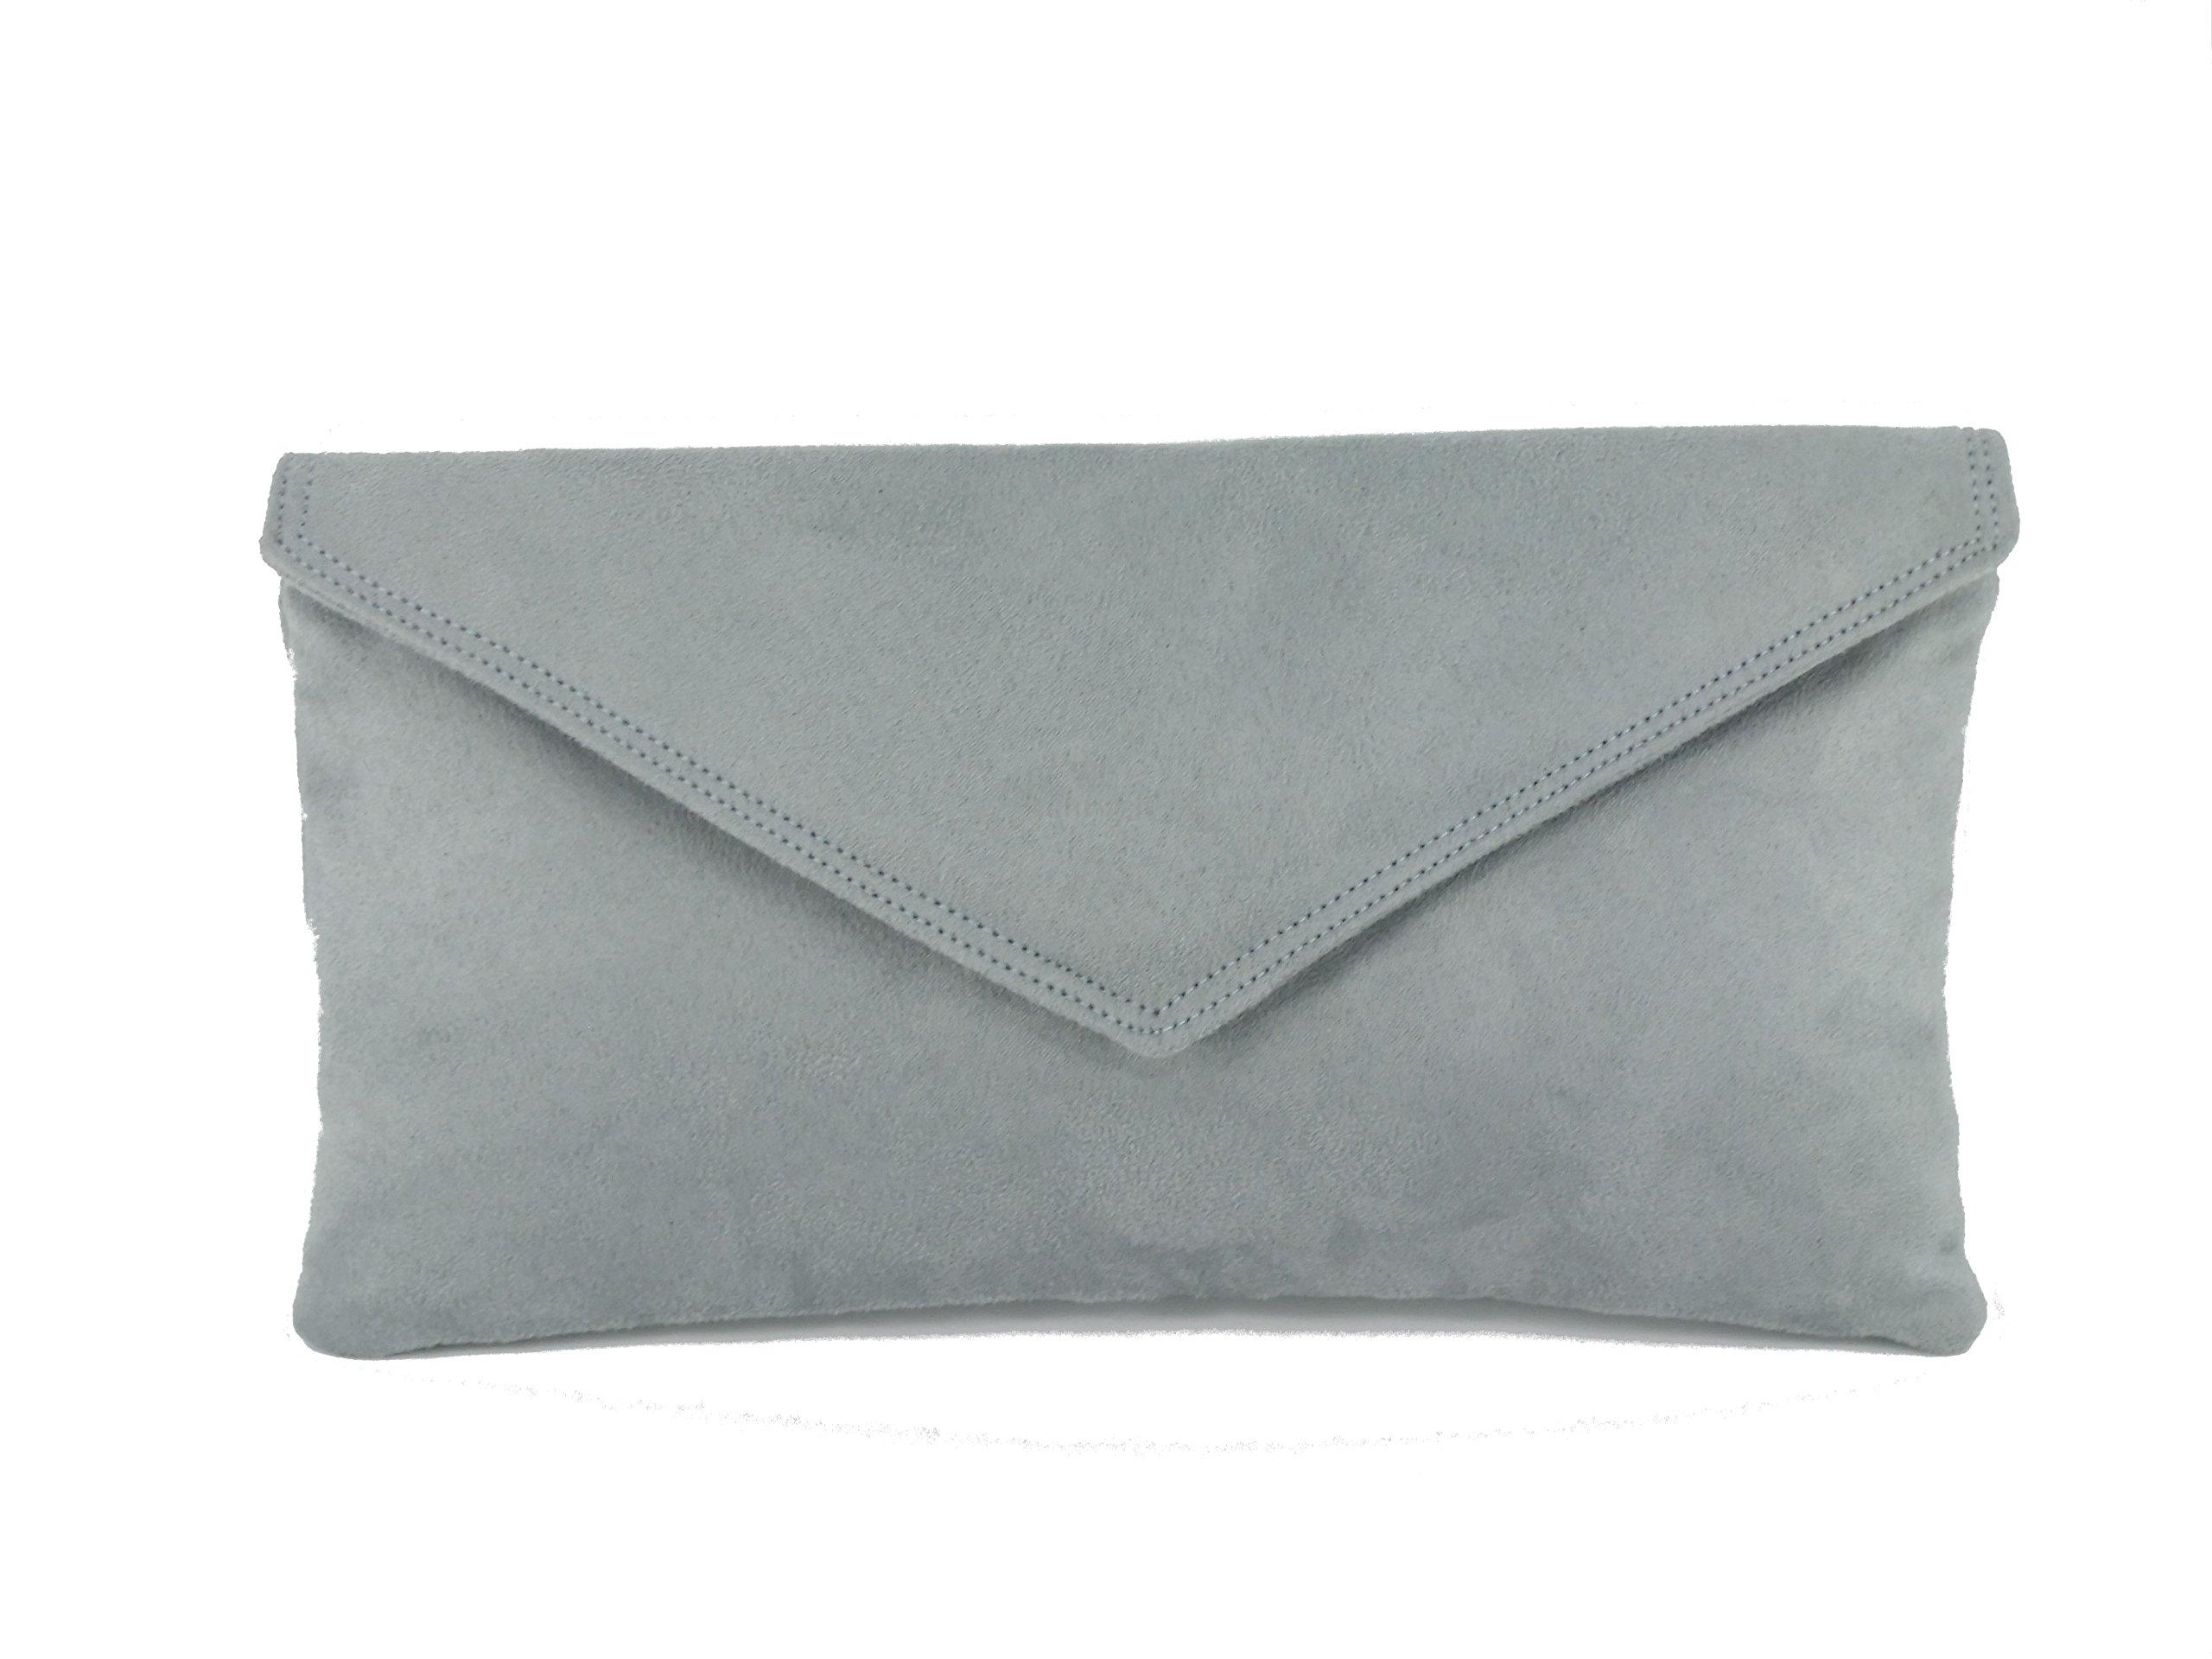 Loni Womens Neat Envelope Faux Suede Clutch Bag/Shoulder Bag in Grey